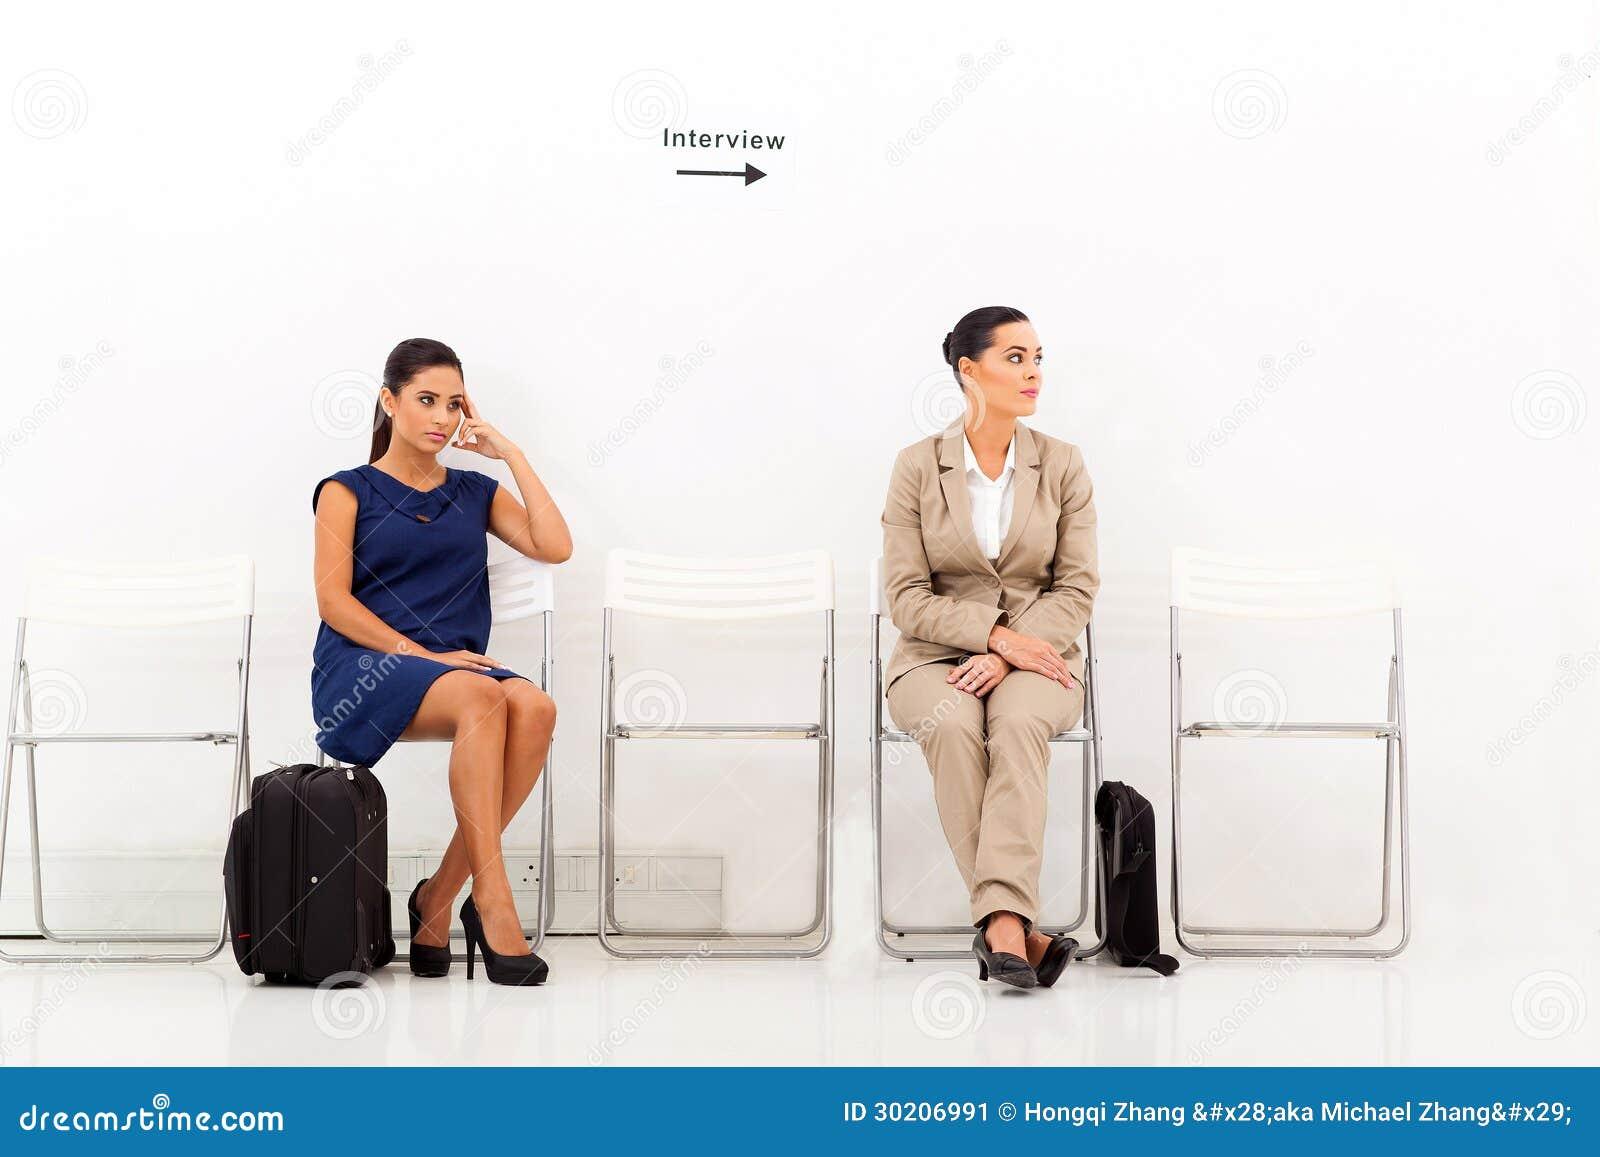 Candidates job interview